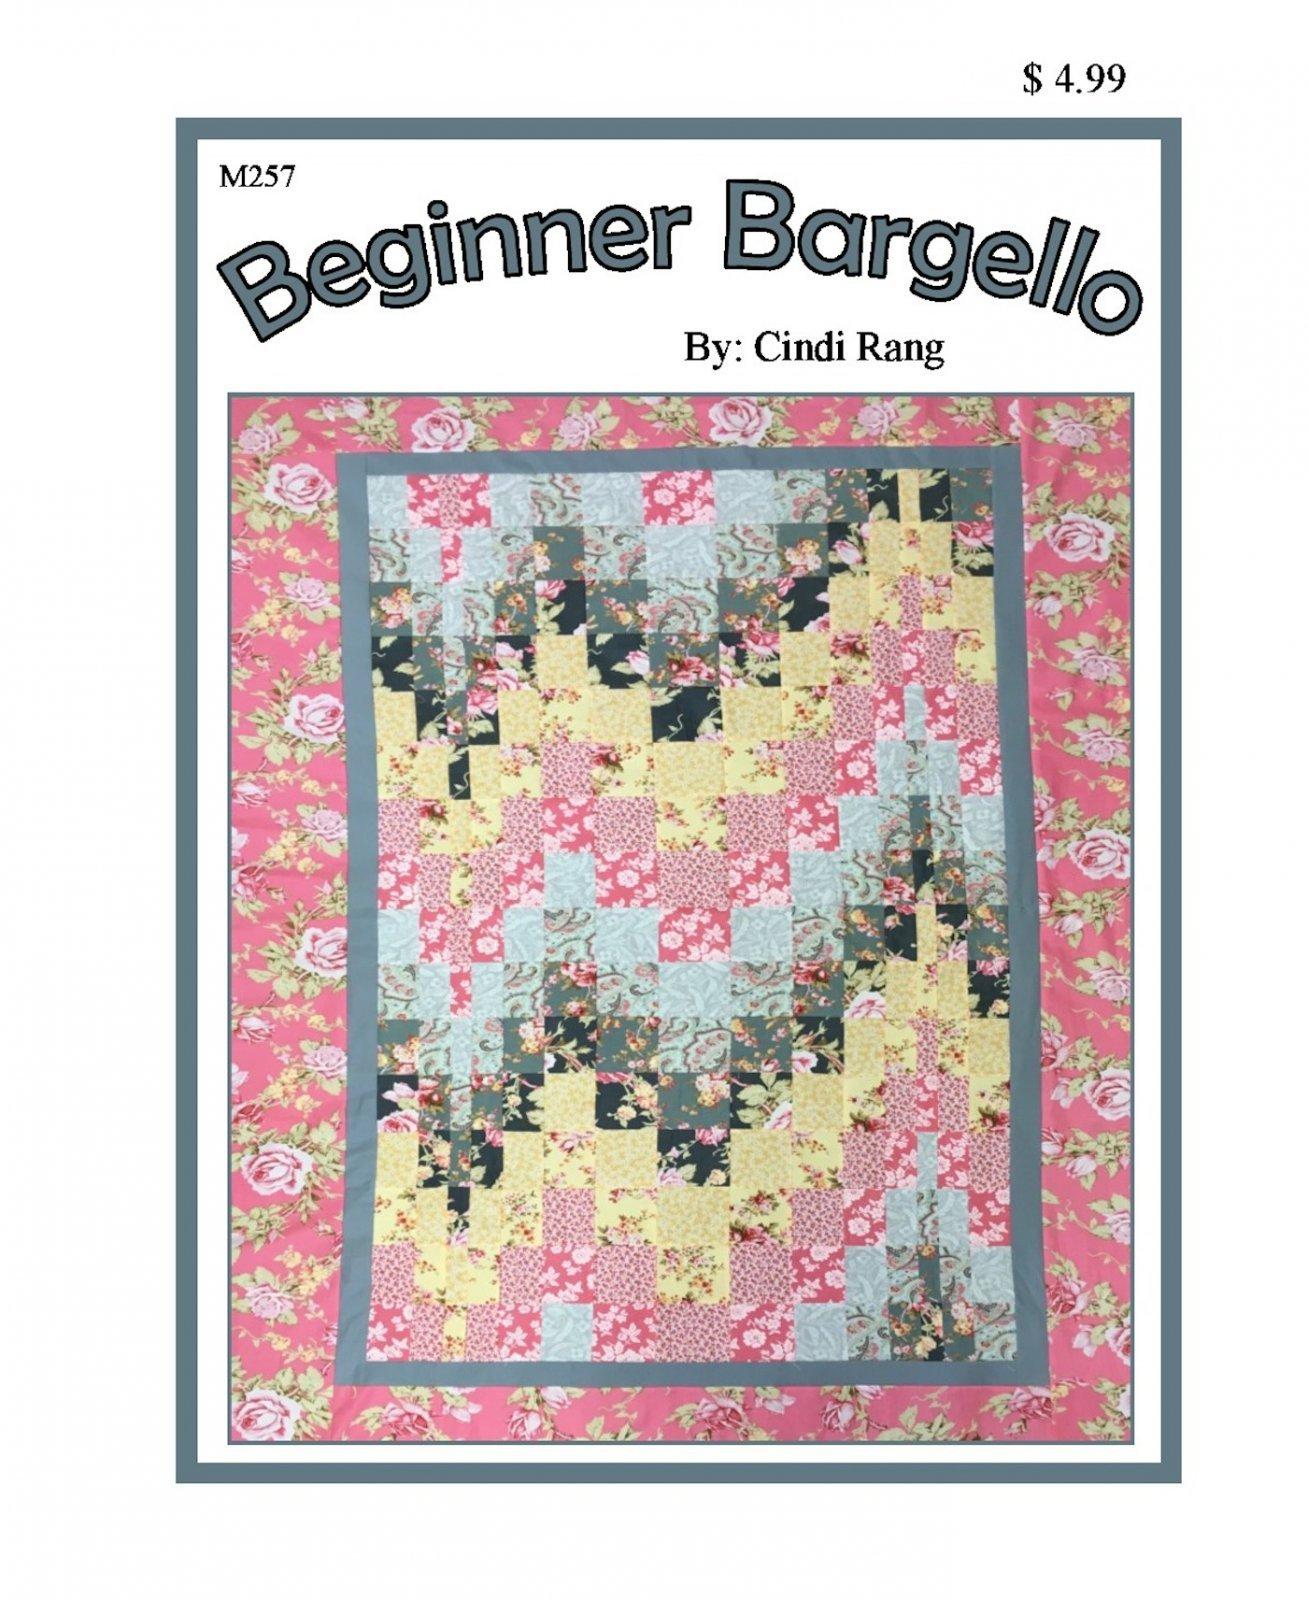 Beginner Bargello Downloadable Pattern